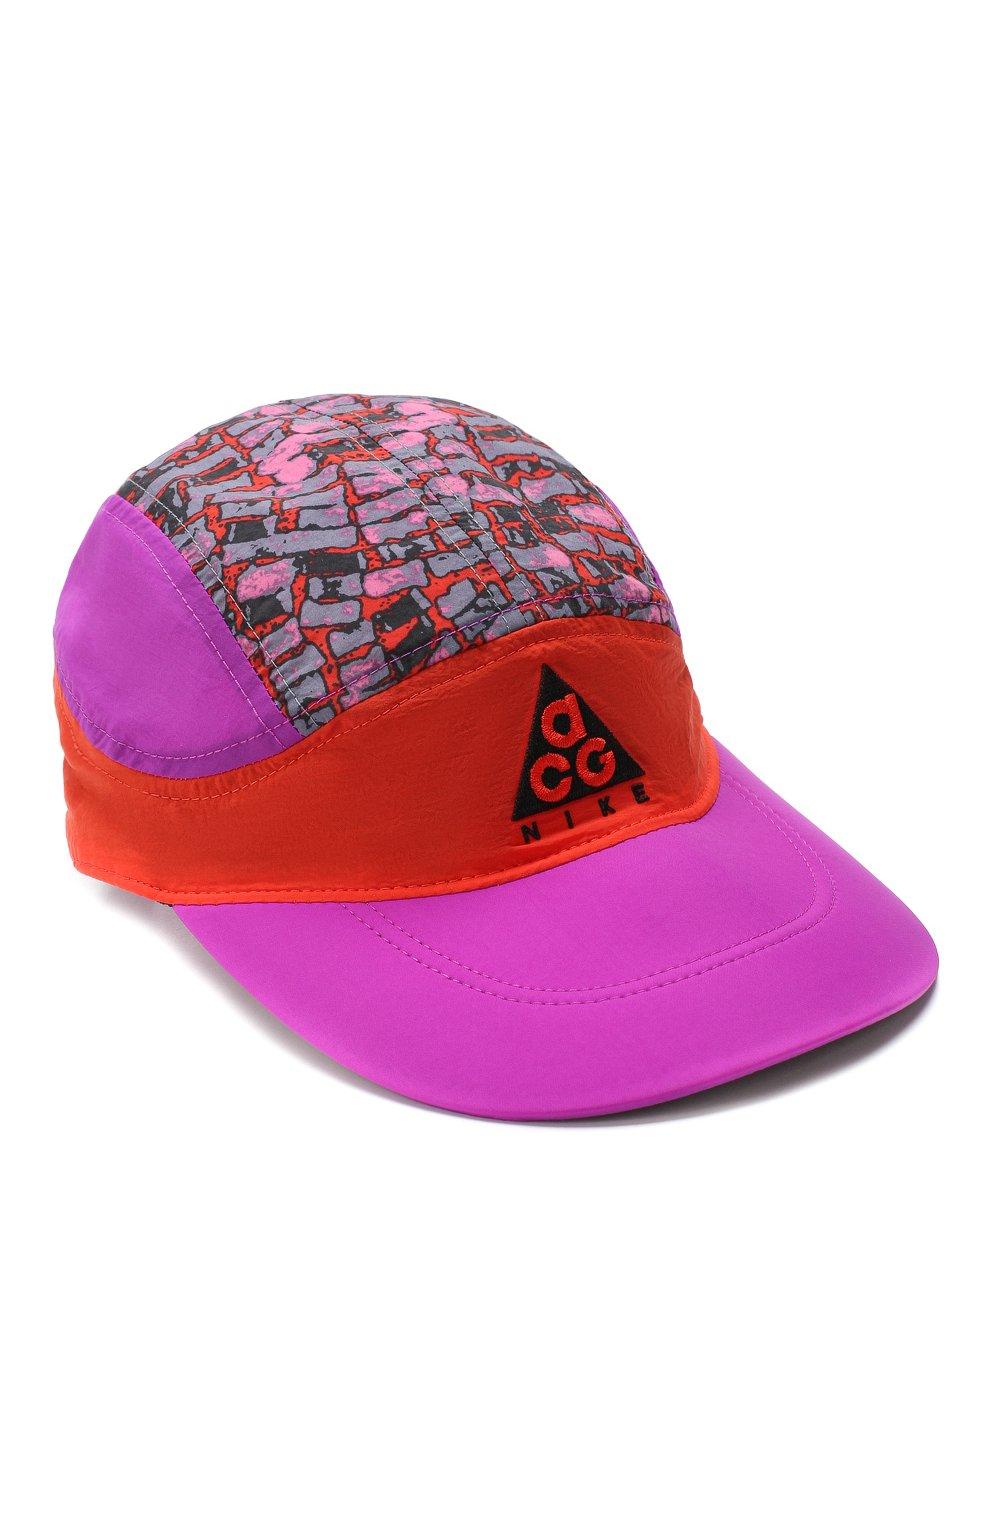 Мужской бейсболка nike acg tailwind NIKELAB разноцветного цвета, арт. BV1046-634 | Фото 1